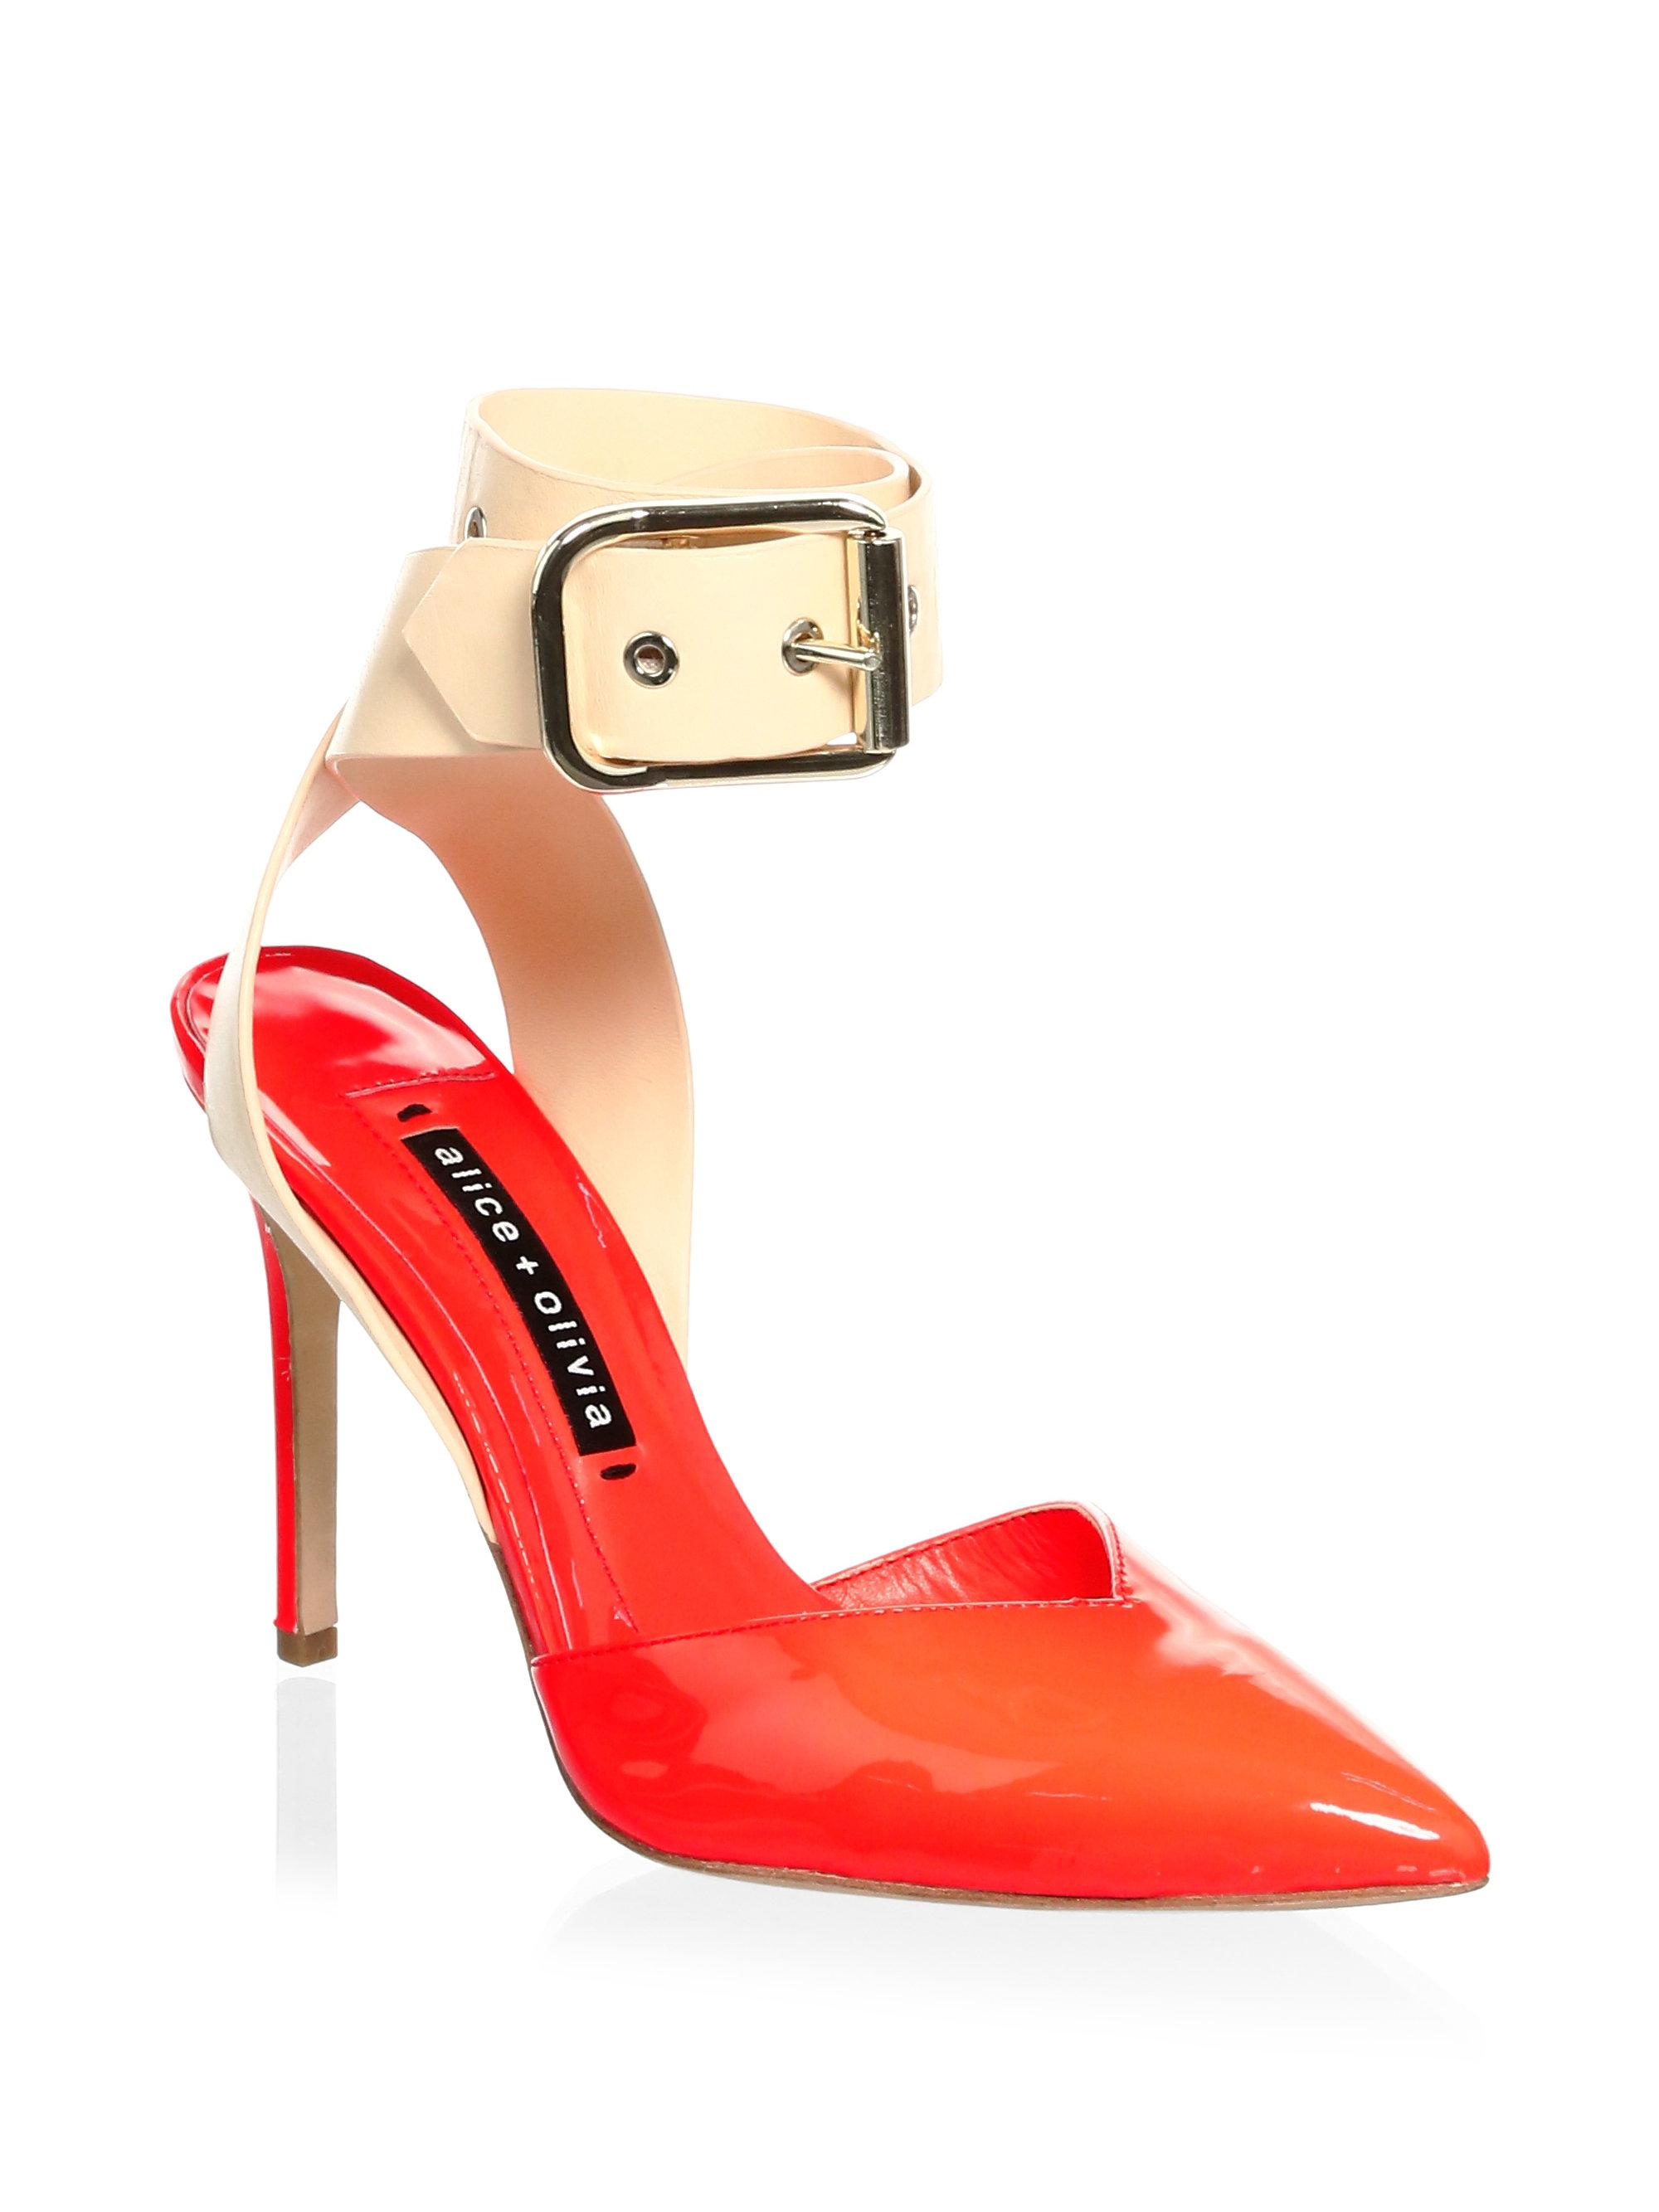 ALICE+OLIVIA Rachelle Patent Leather Point Toe Pumps PbAxO